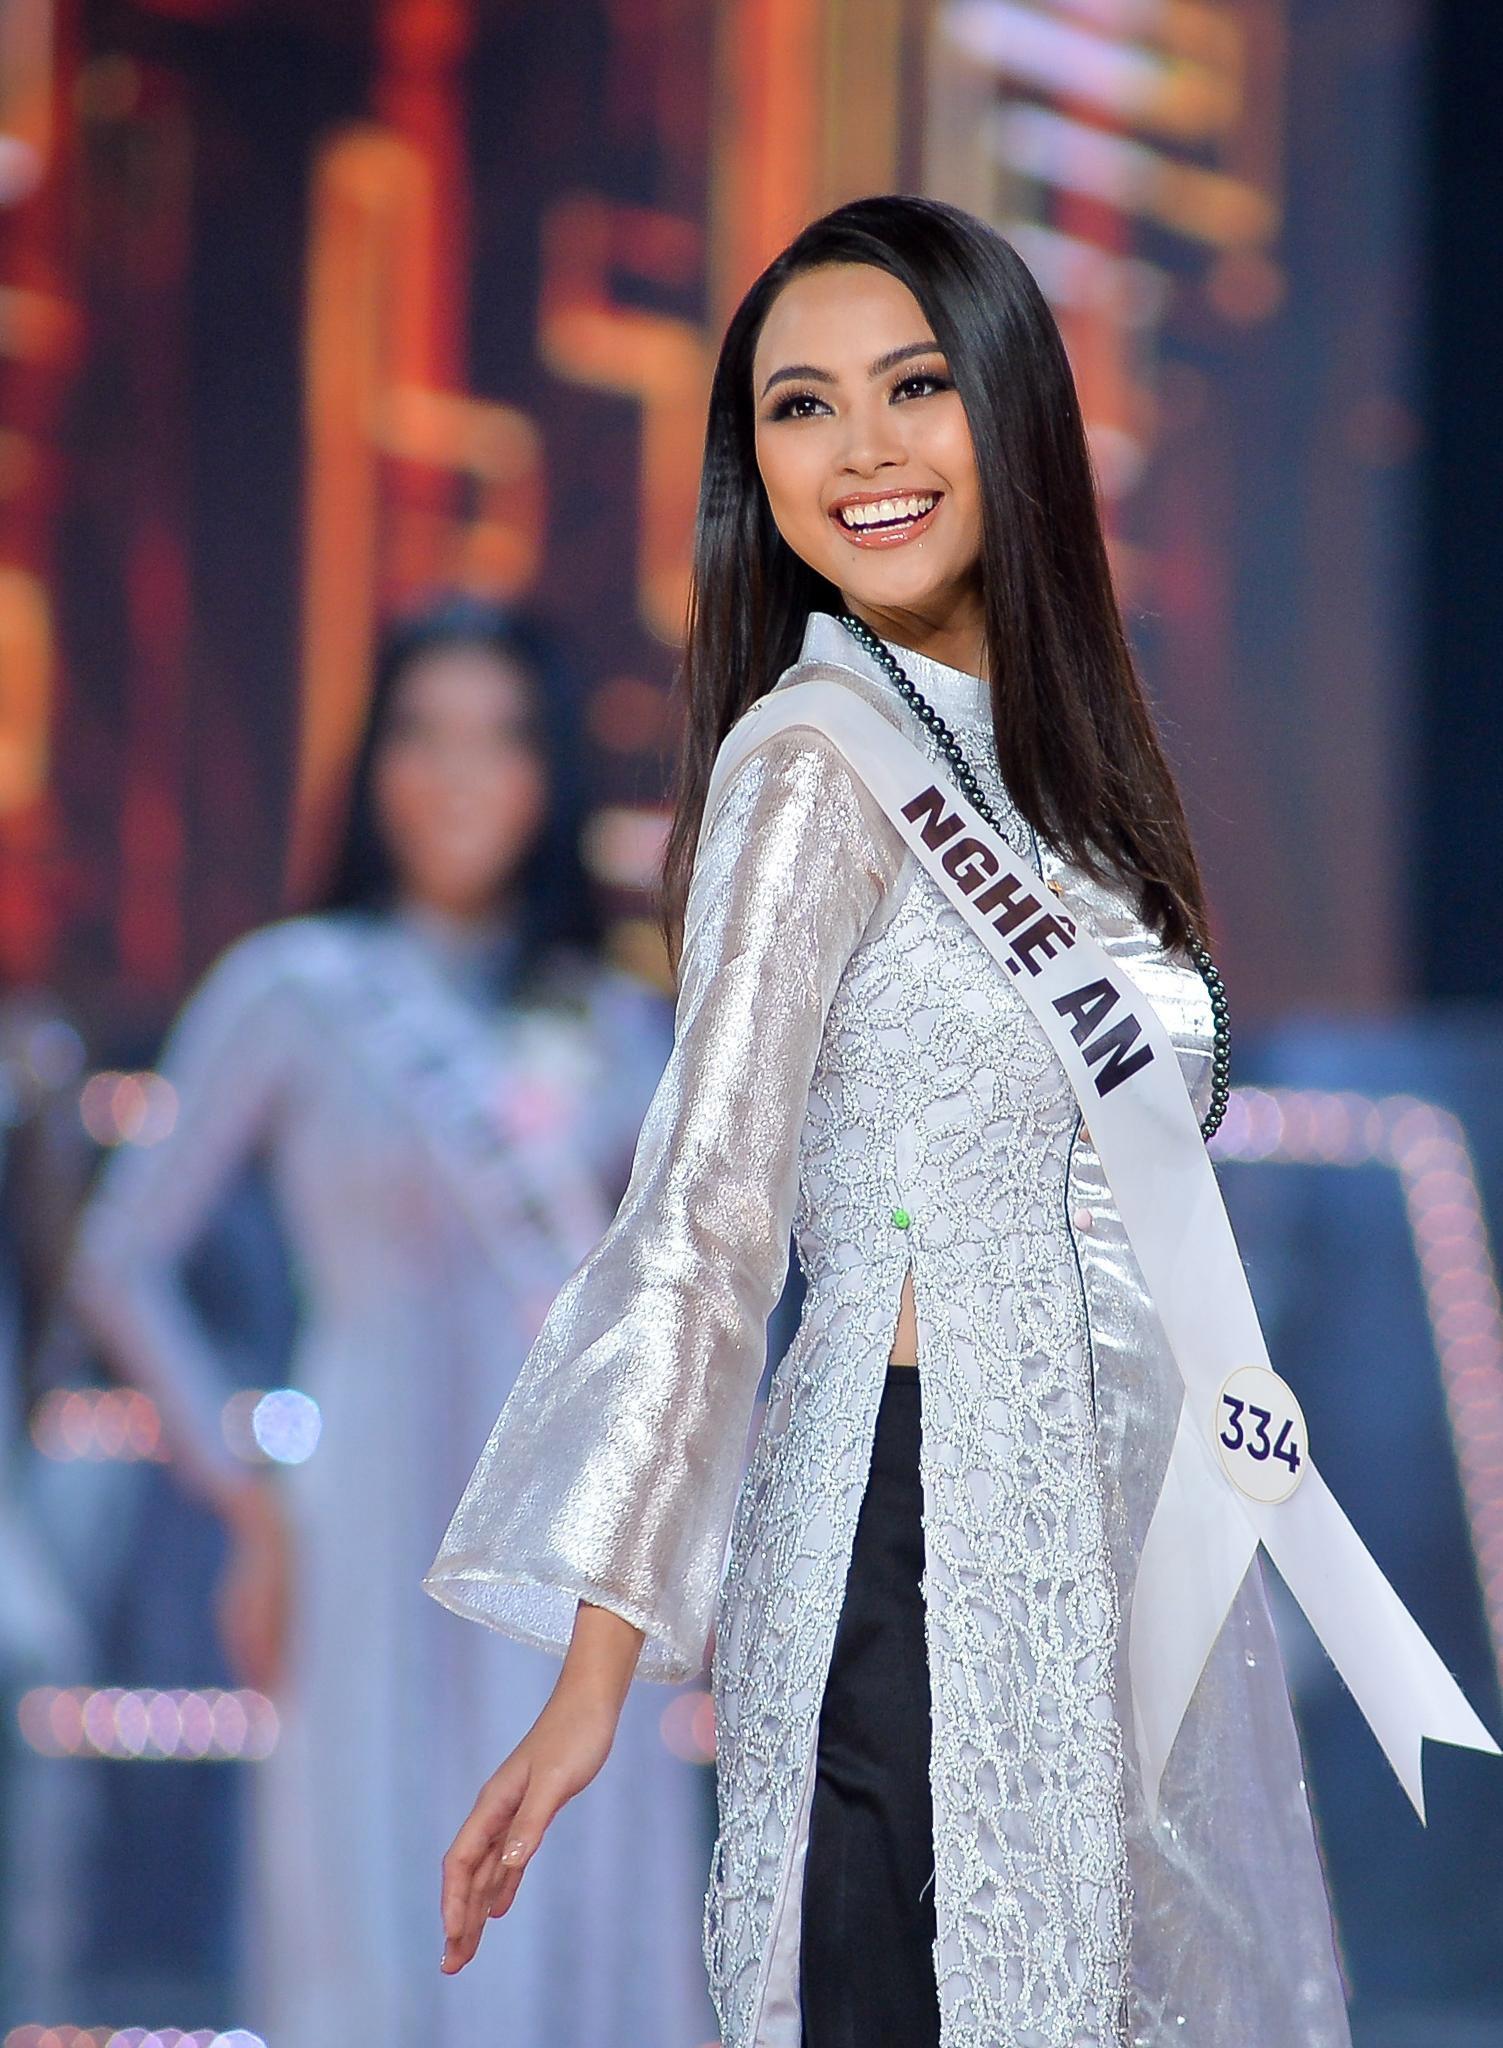 7 nguoi dep co the dang quang Hoa hau Hoan vu Viet Nam 2019 hinh anh 19